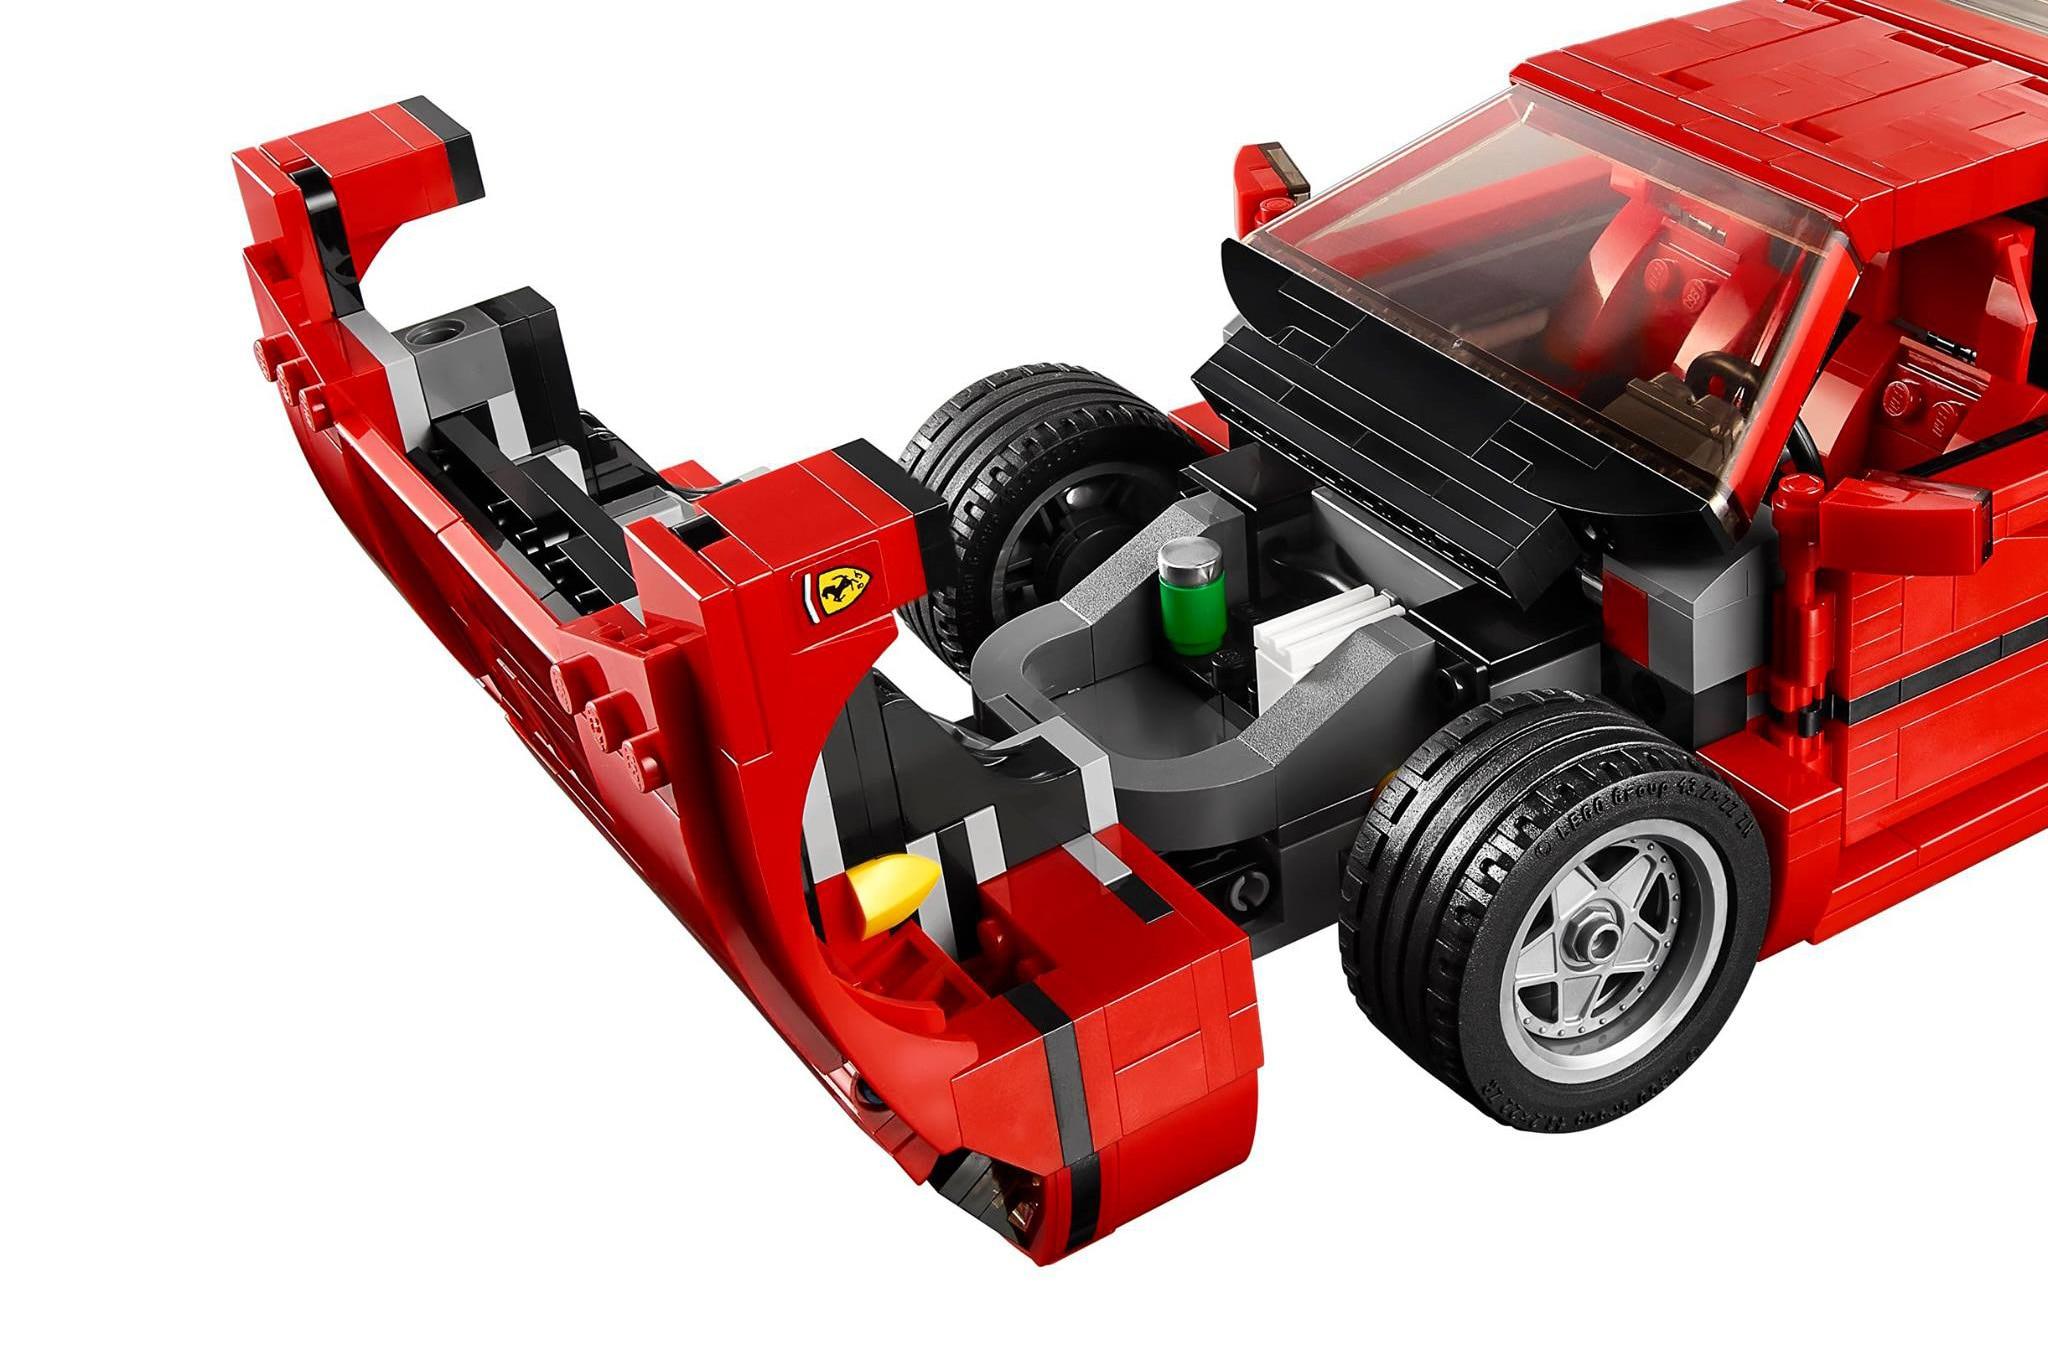 lego releases detailed ferrari f40 creator set. Black Bedroom Furniture Sets. Home Design Ideas